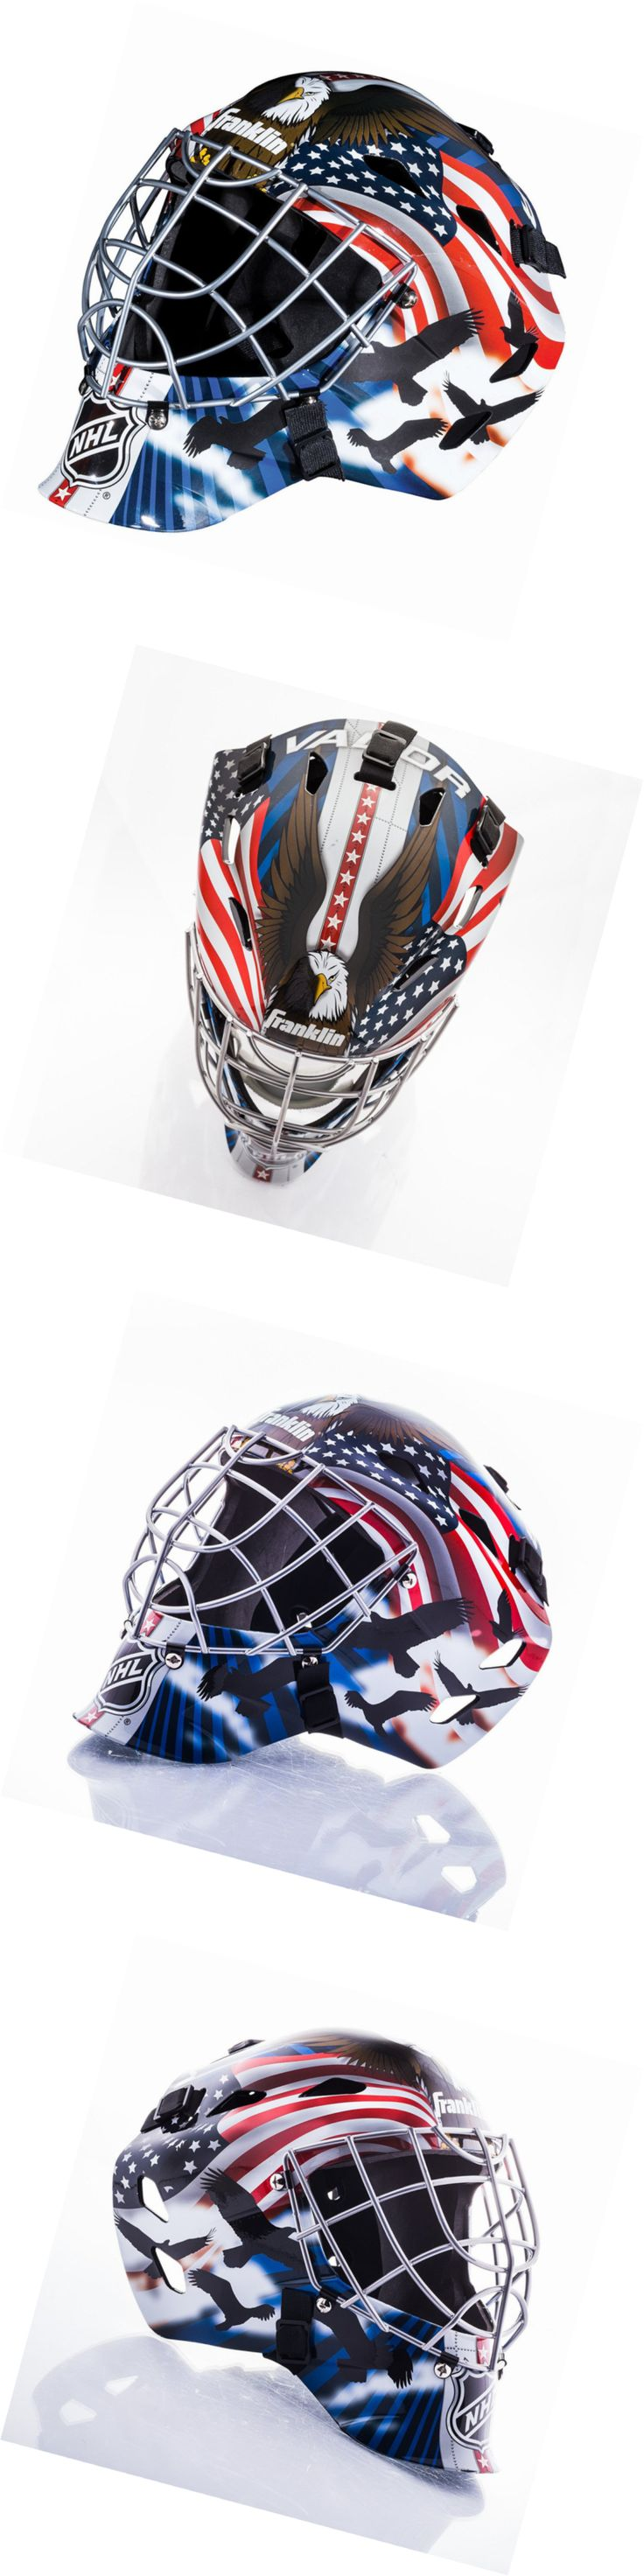 Face Masks 79762: Franklin Sports Gfm 1500 Street Hockey Goalie Face Mask -> BUY IT NOW ONLY: $44.76 on eBay!